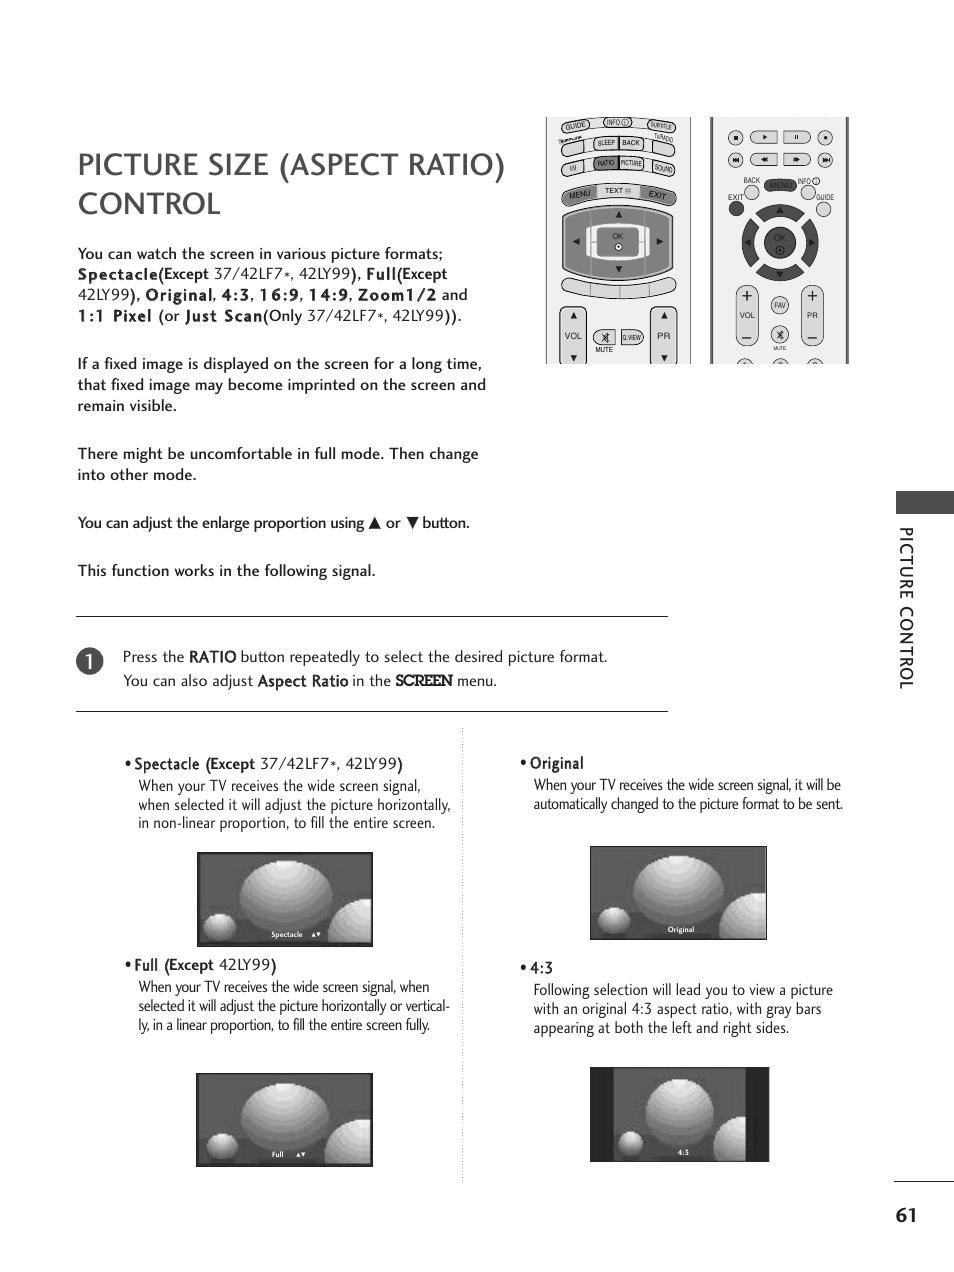 Picture size (aspect ratio)control, Picture size (aspect